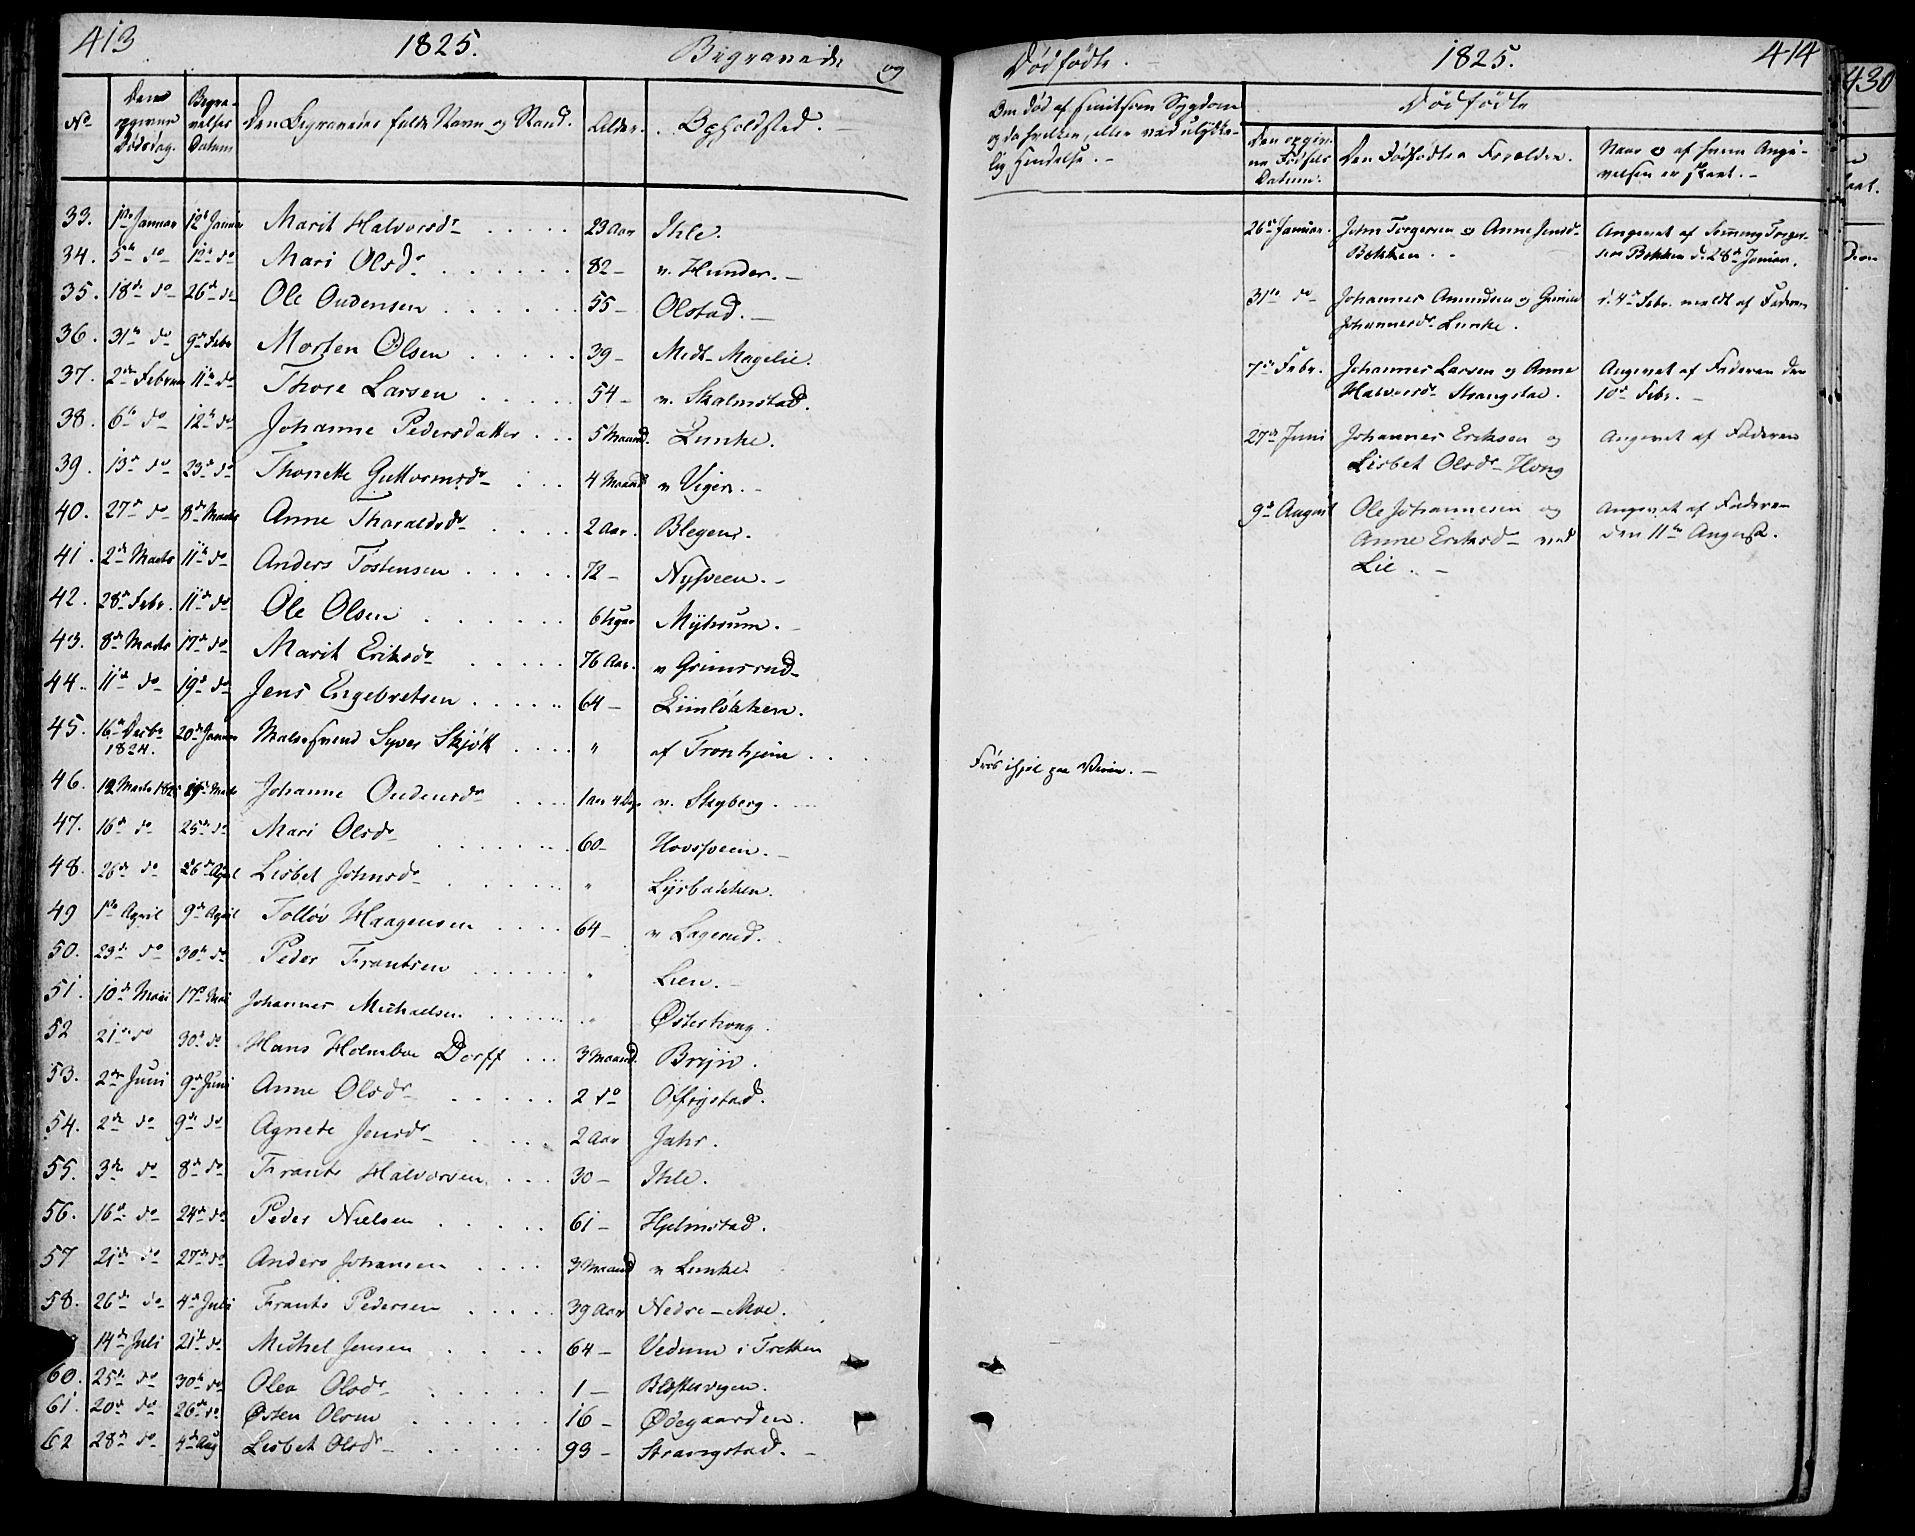 SAH, Øyer prestekontor, Ministerialbok nr. 4, 1824-1841, s. 413-414